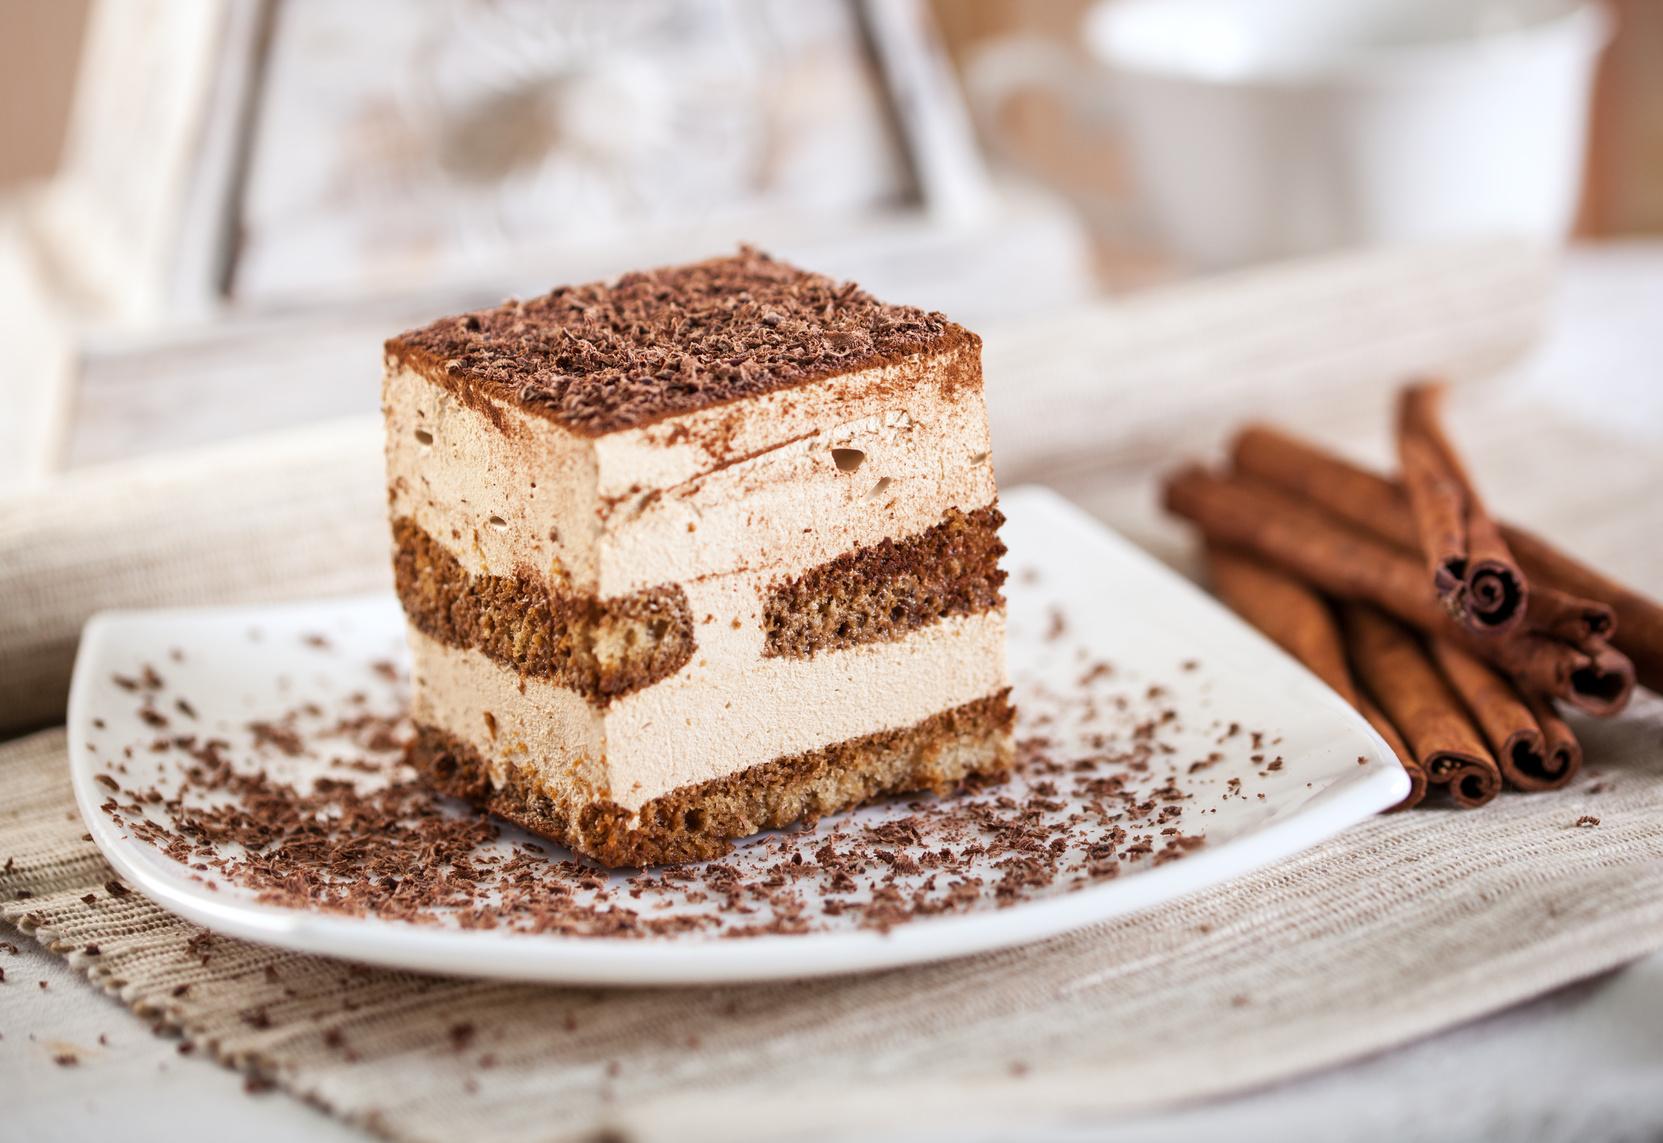 Easy Cake Recipt